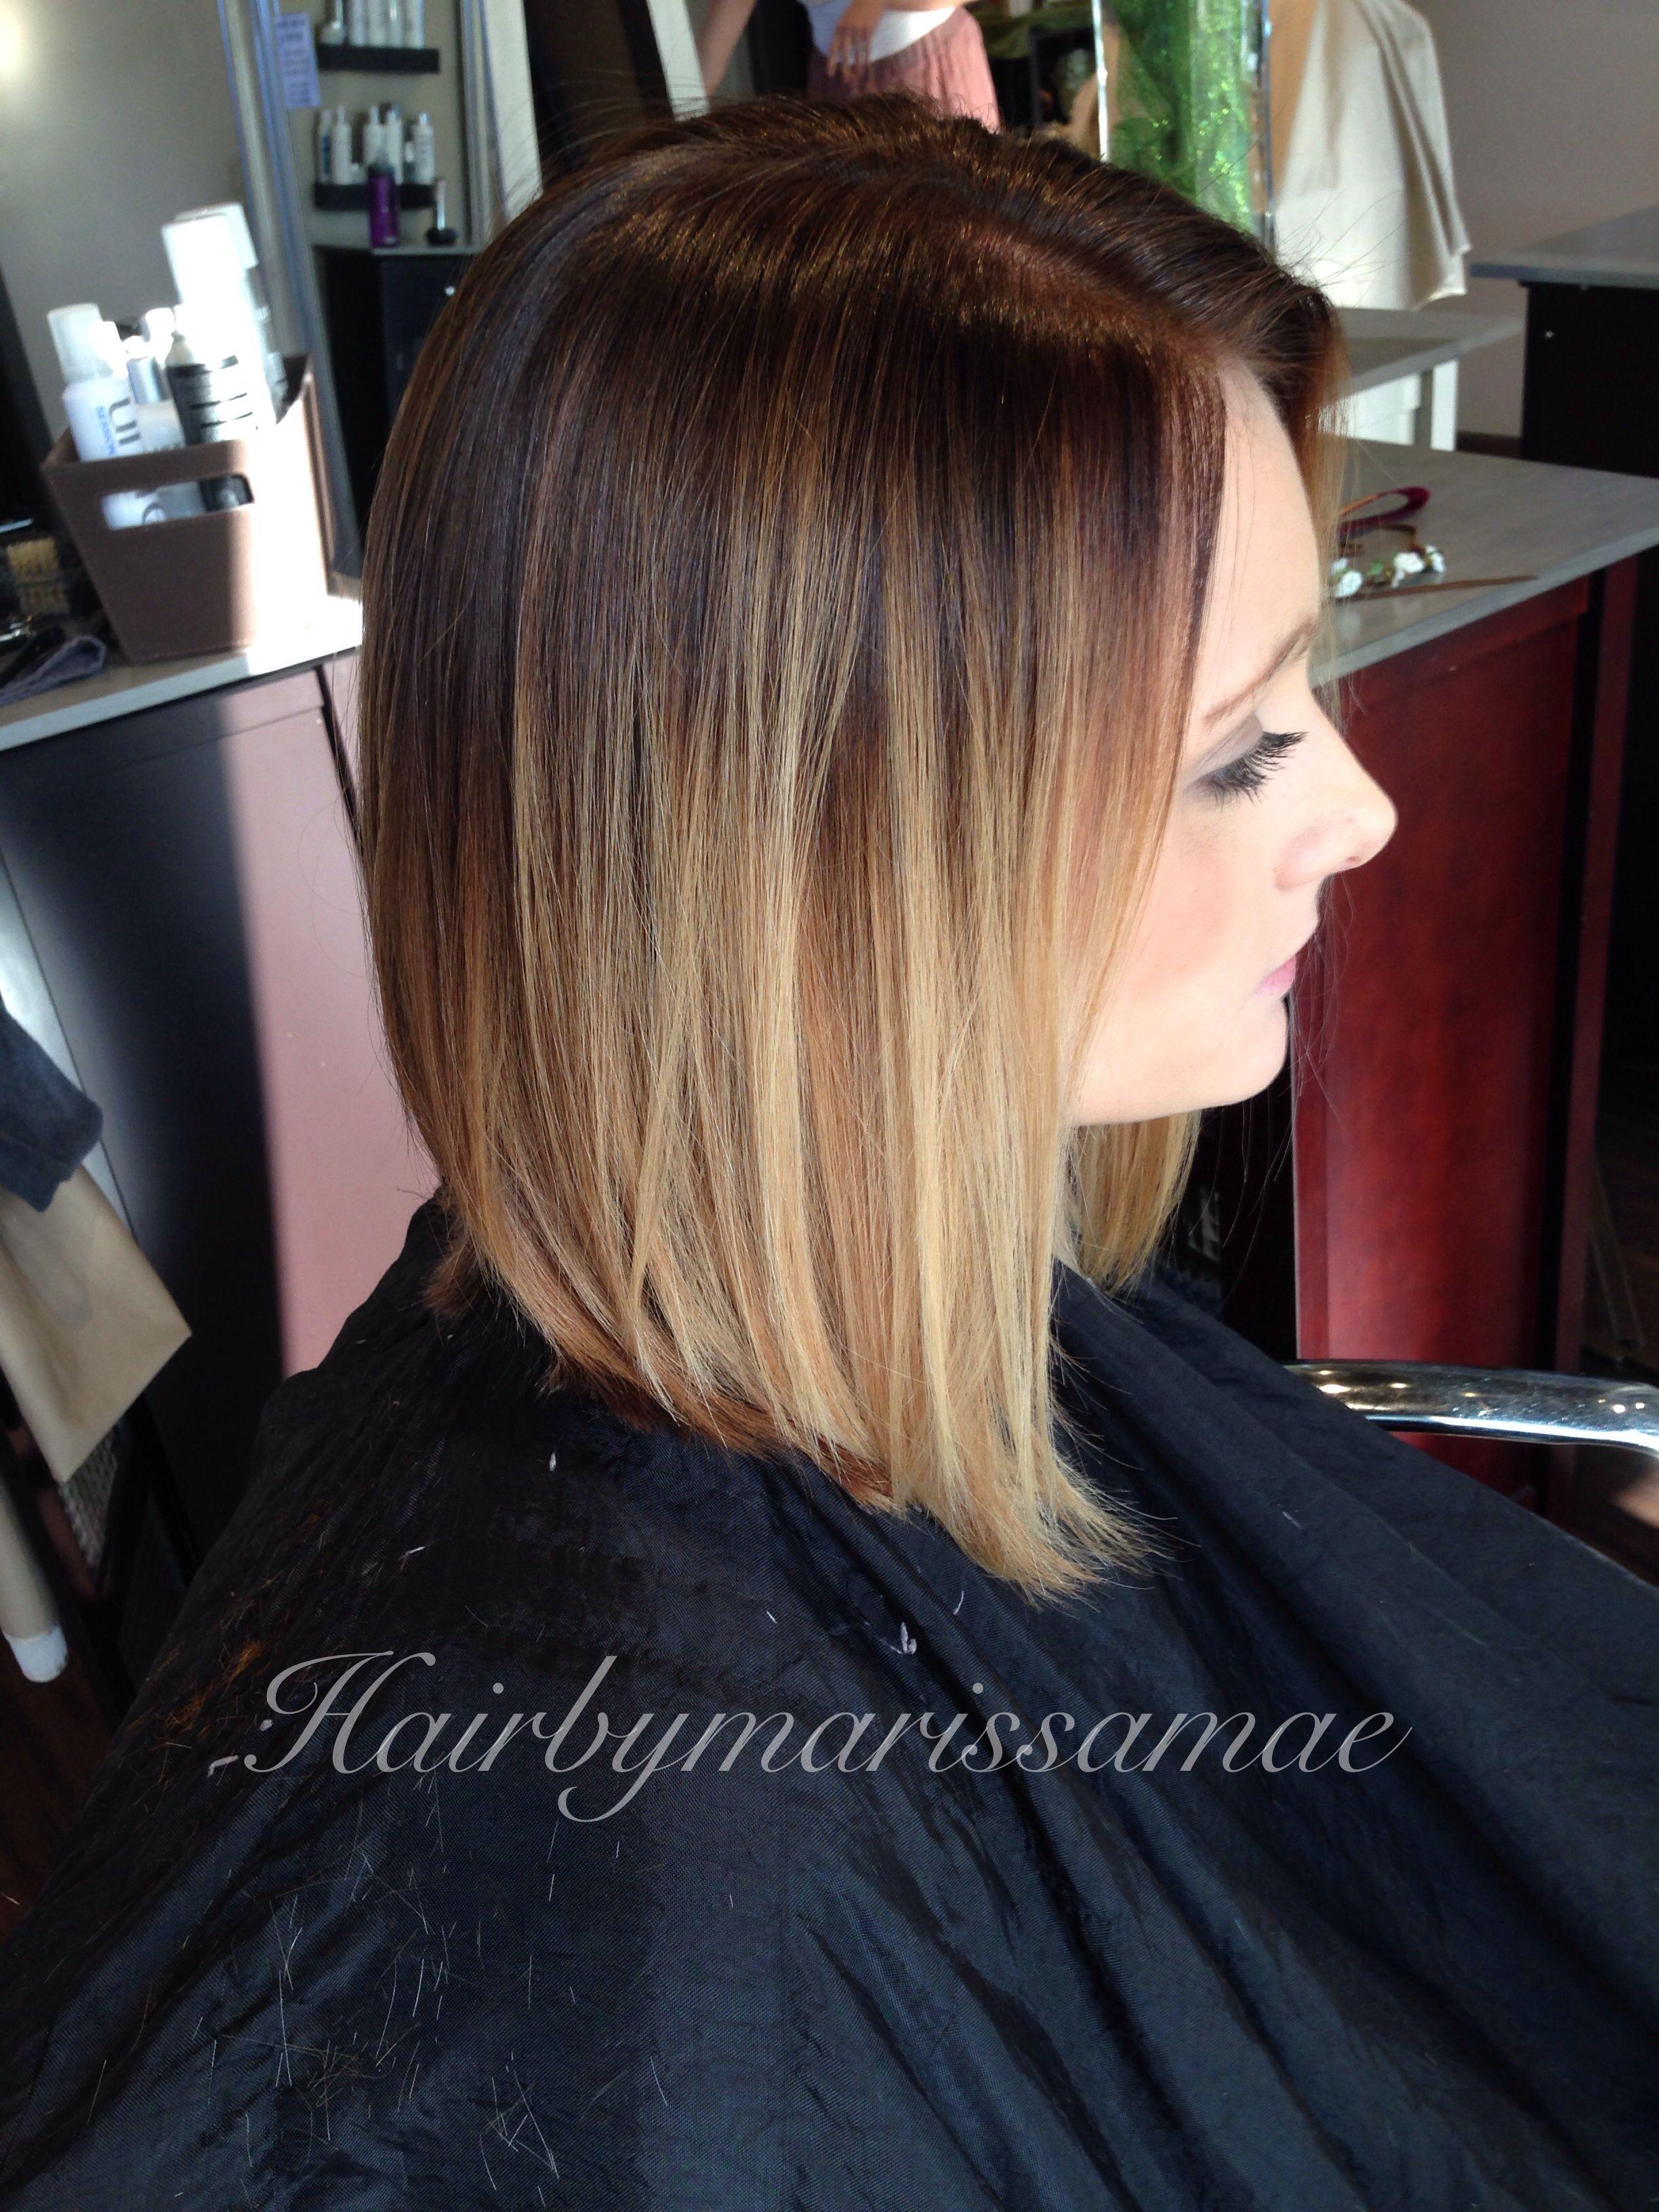 ombr233 on a long aline my work dyed hair hair styles hair